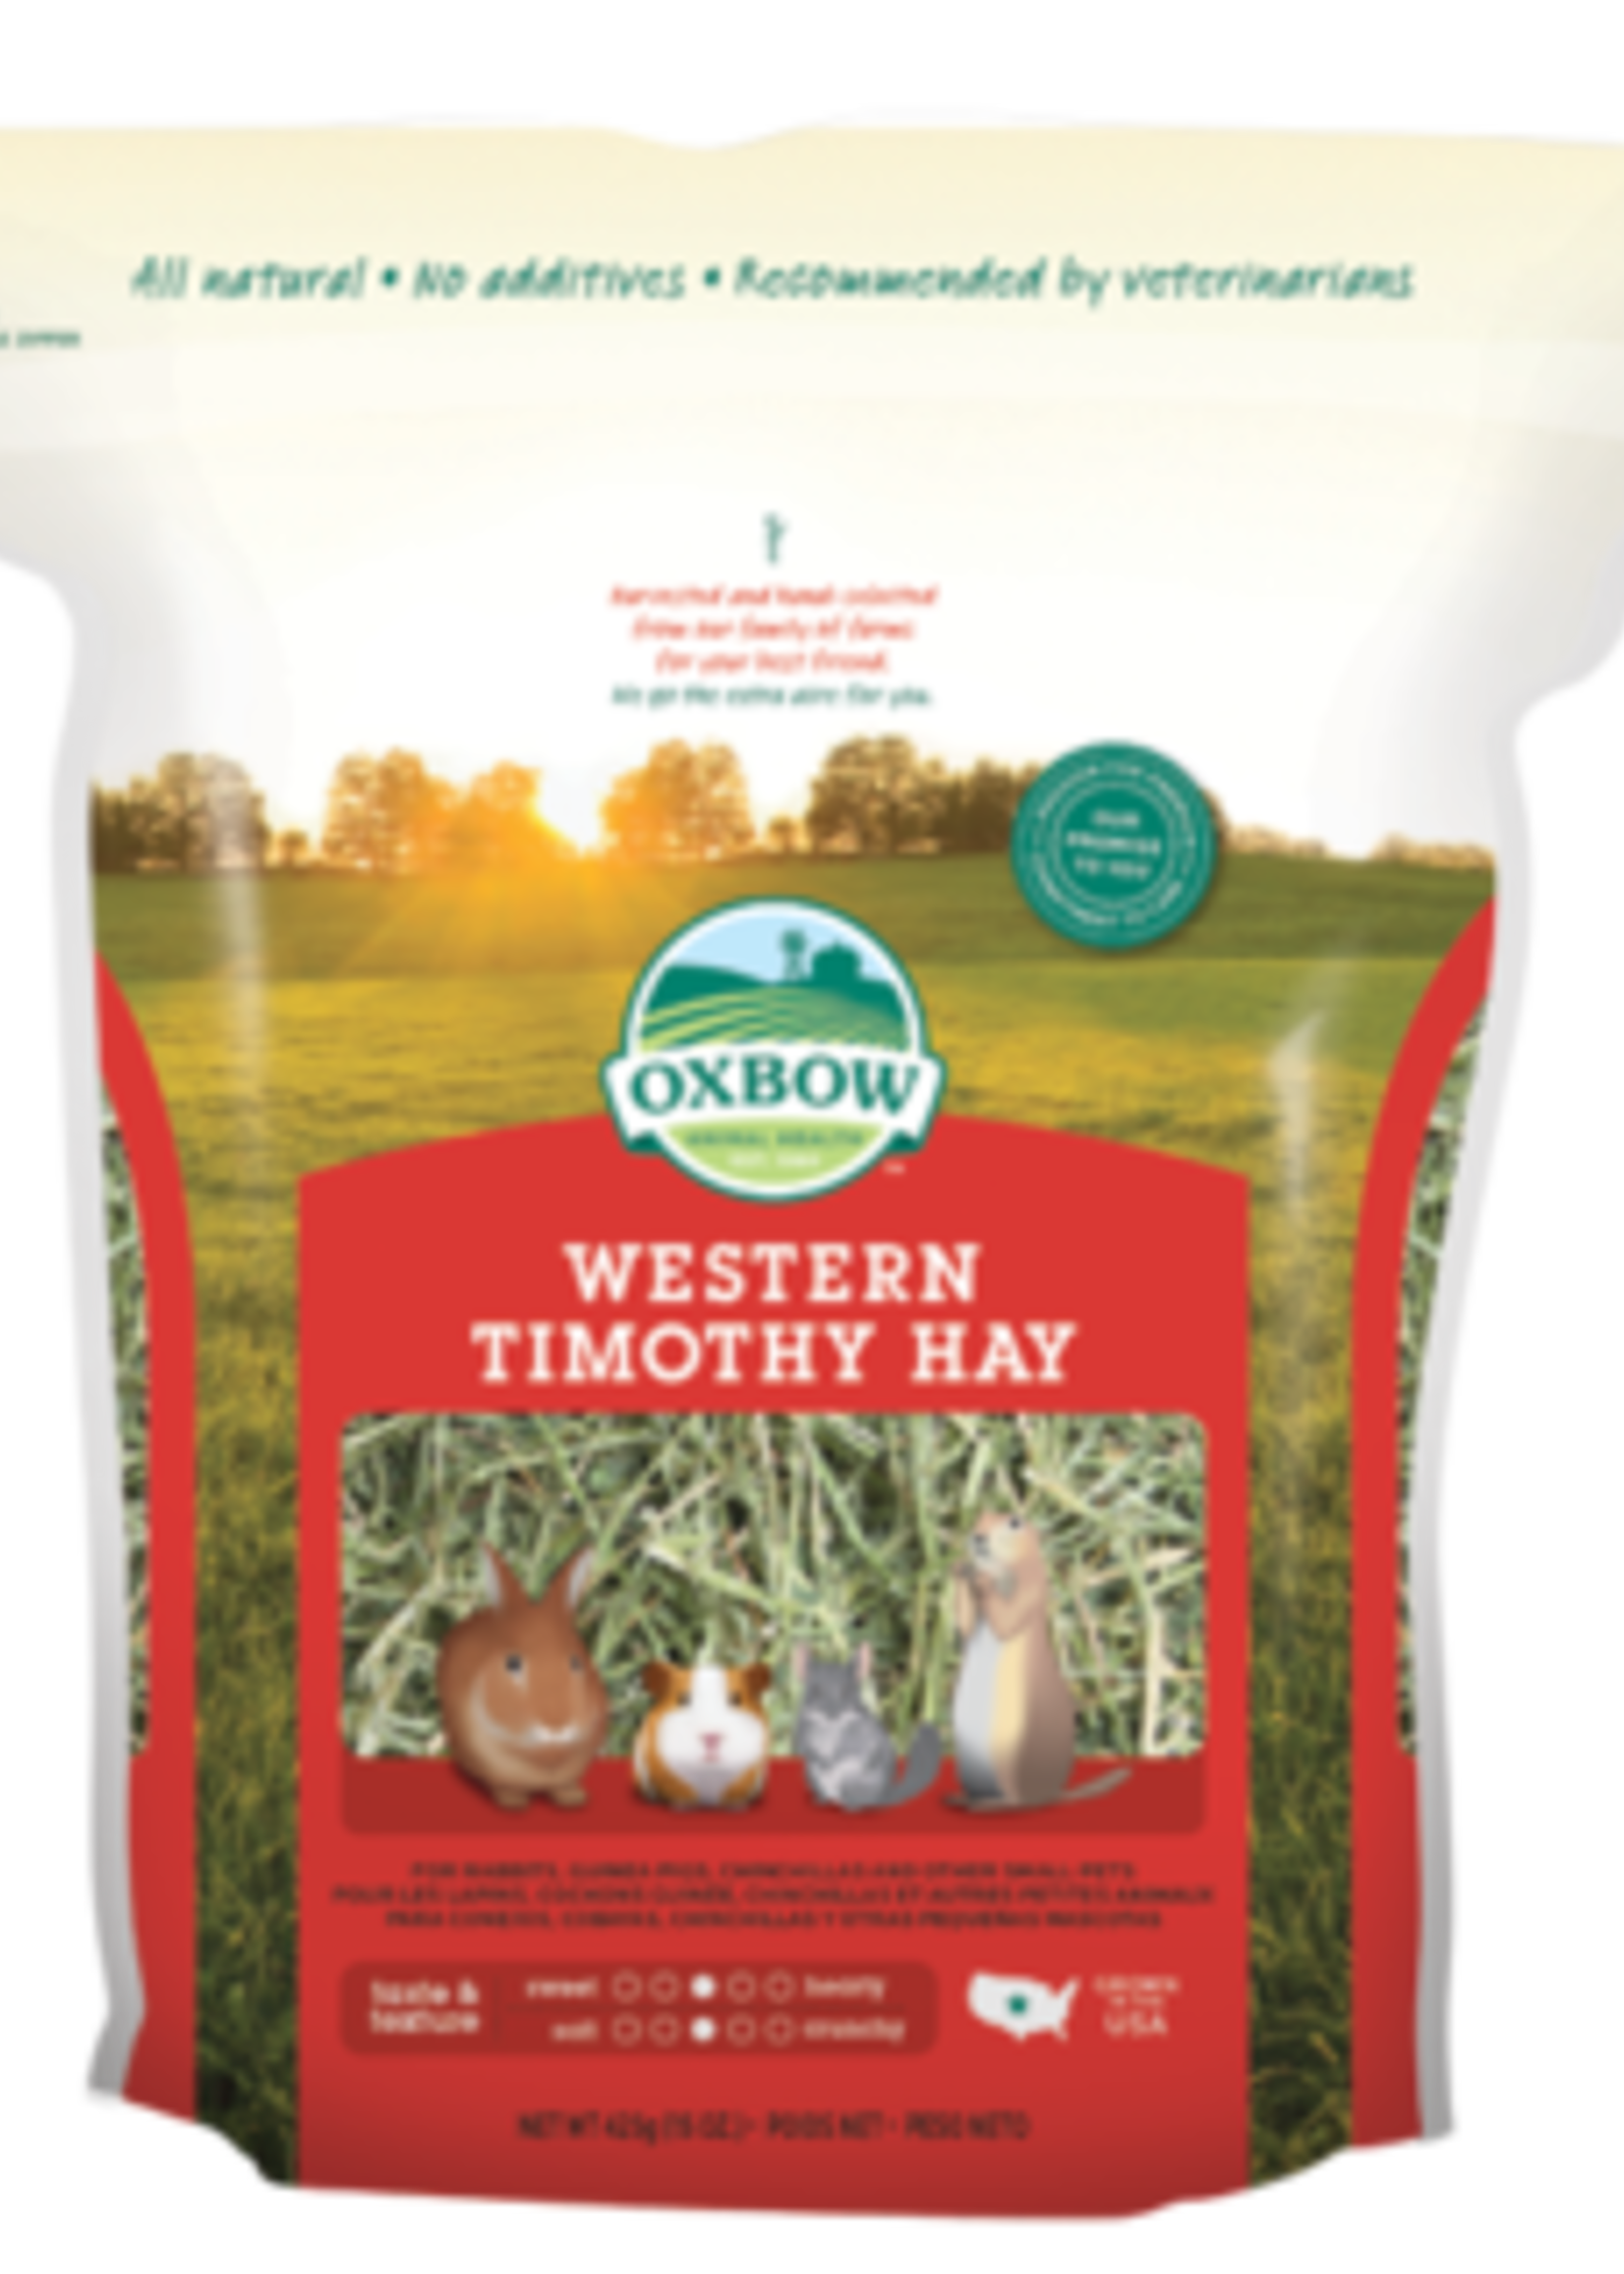 Oxbow Animal Health™ OXBOW WESTERN TIMOTHY HAY 15oz